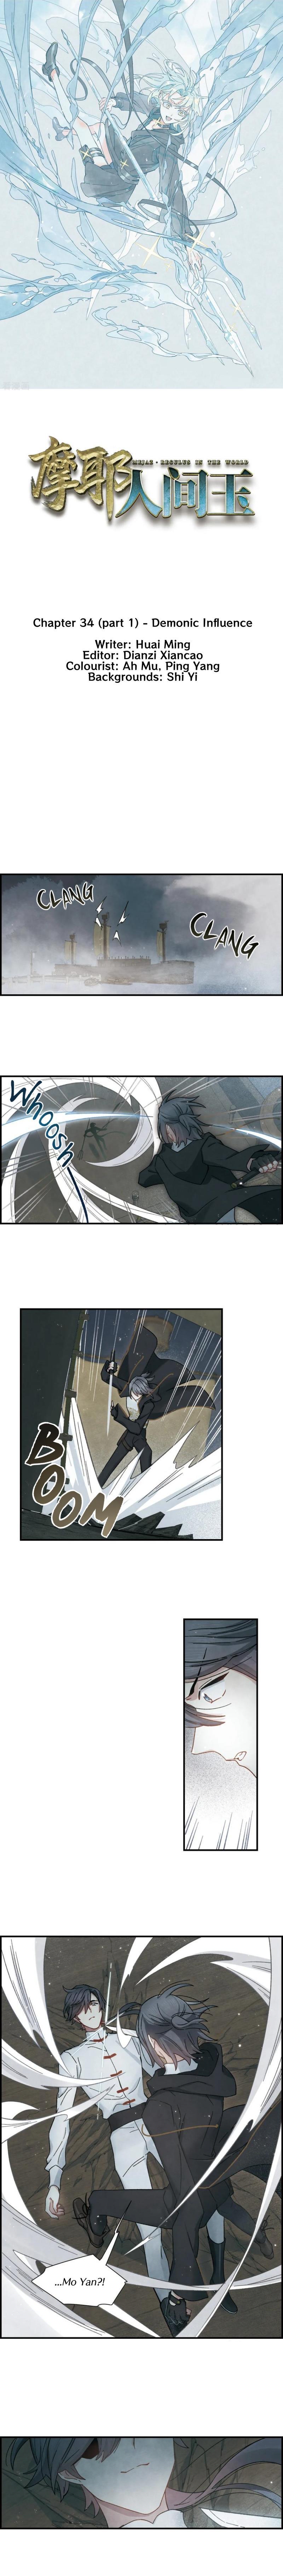 Mejaz - Regulus In The World Chapter 34.1: Demonic Influence page 2 - Mangakakalots.com